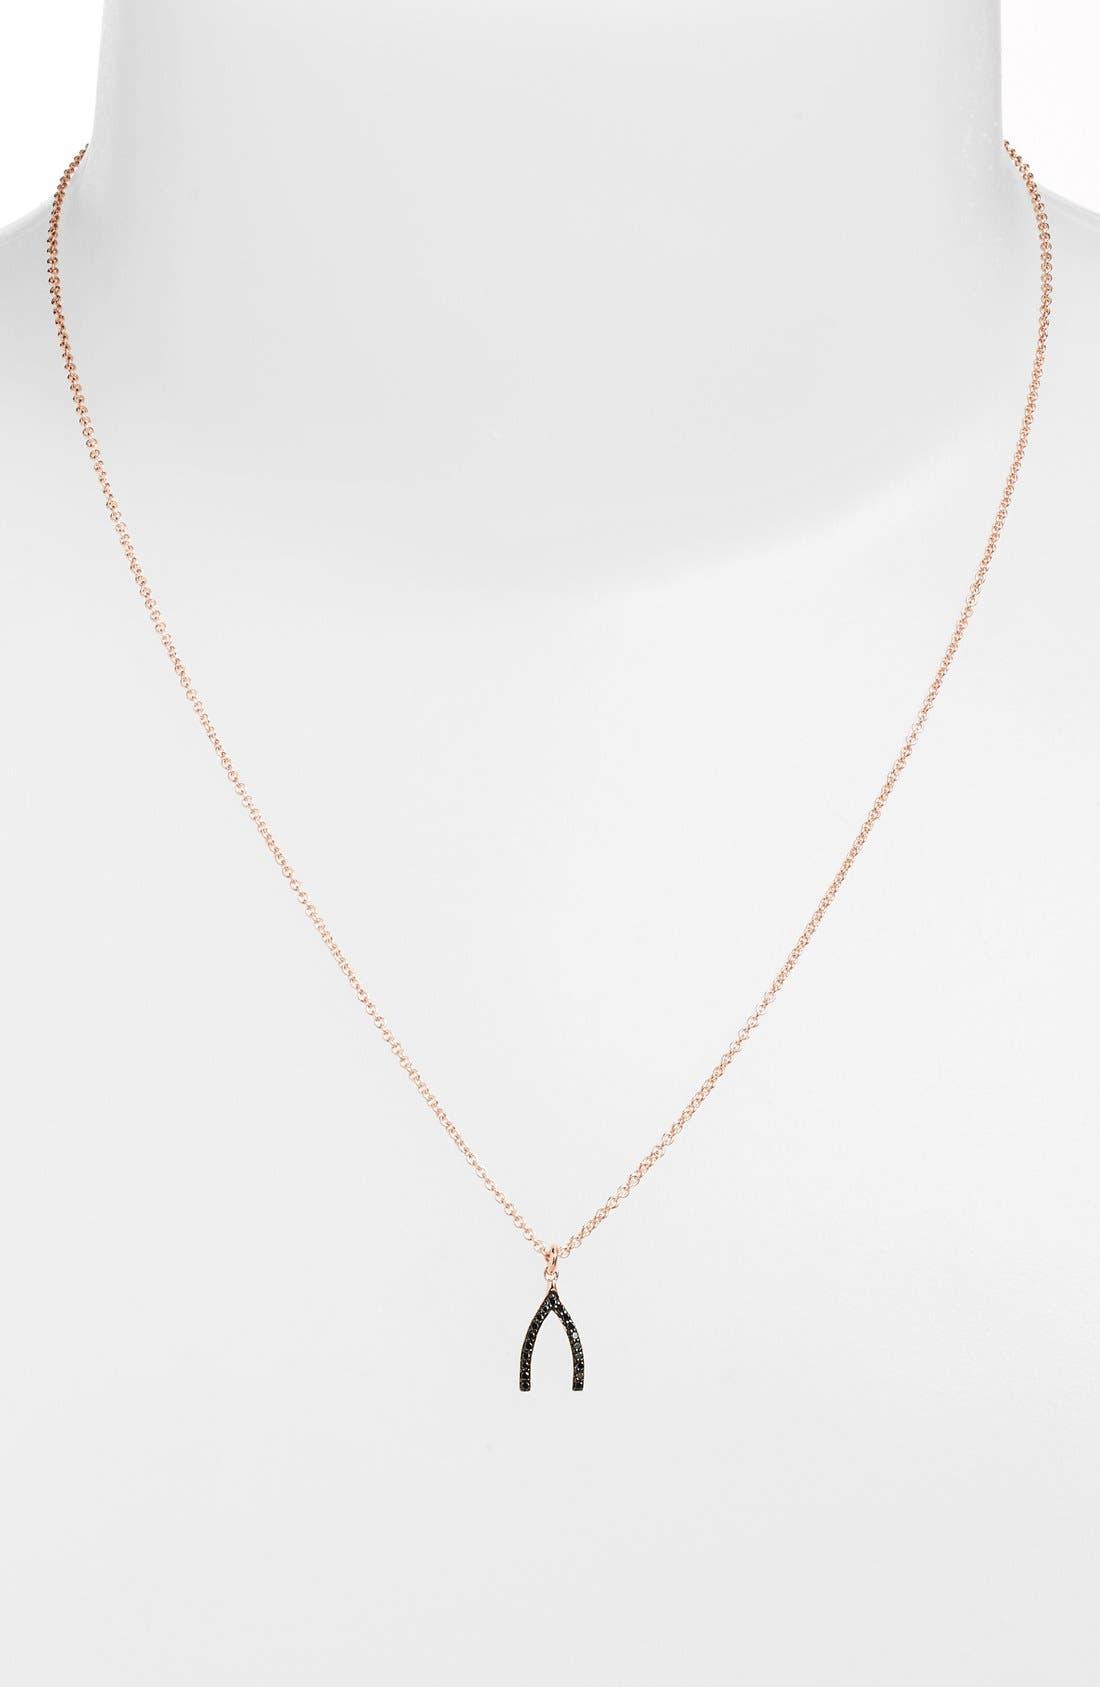 Main Image - Sugar Bean Jewelry Wishbone Pendant Necklace